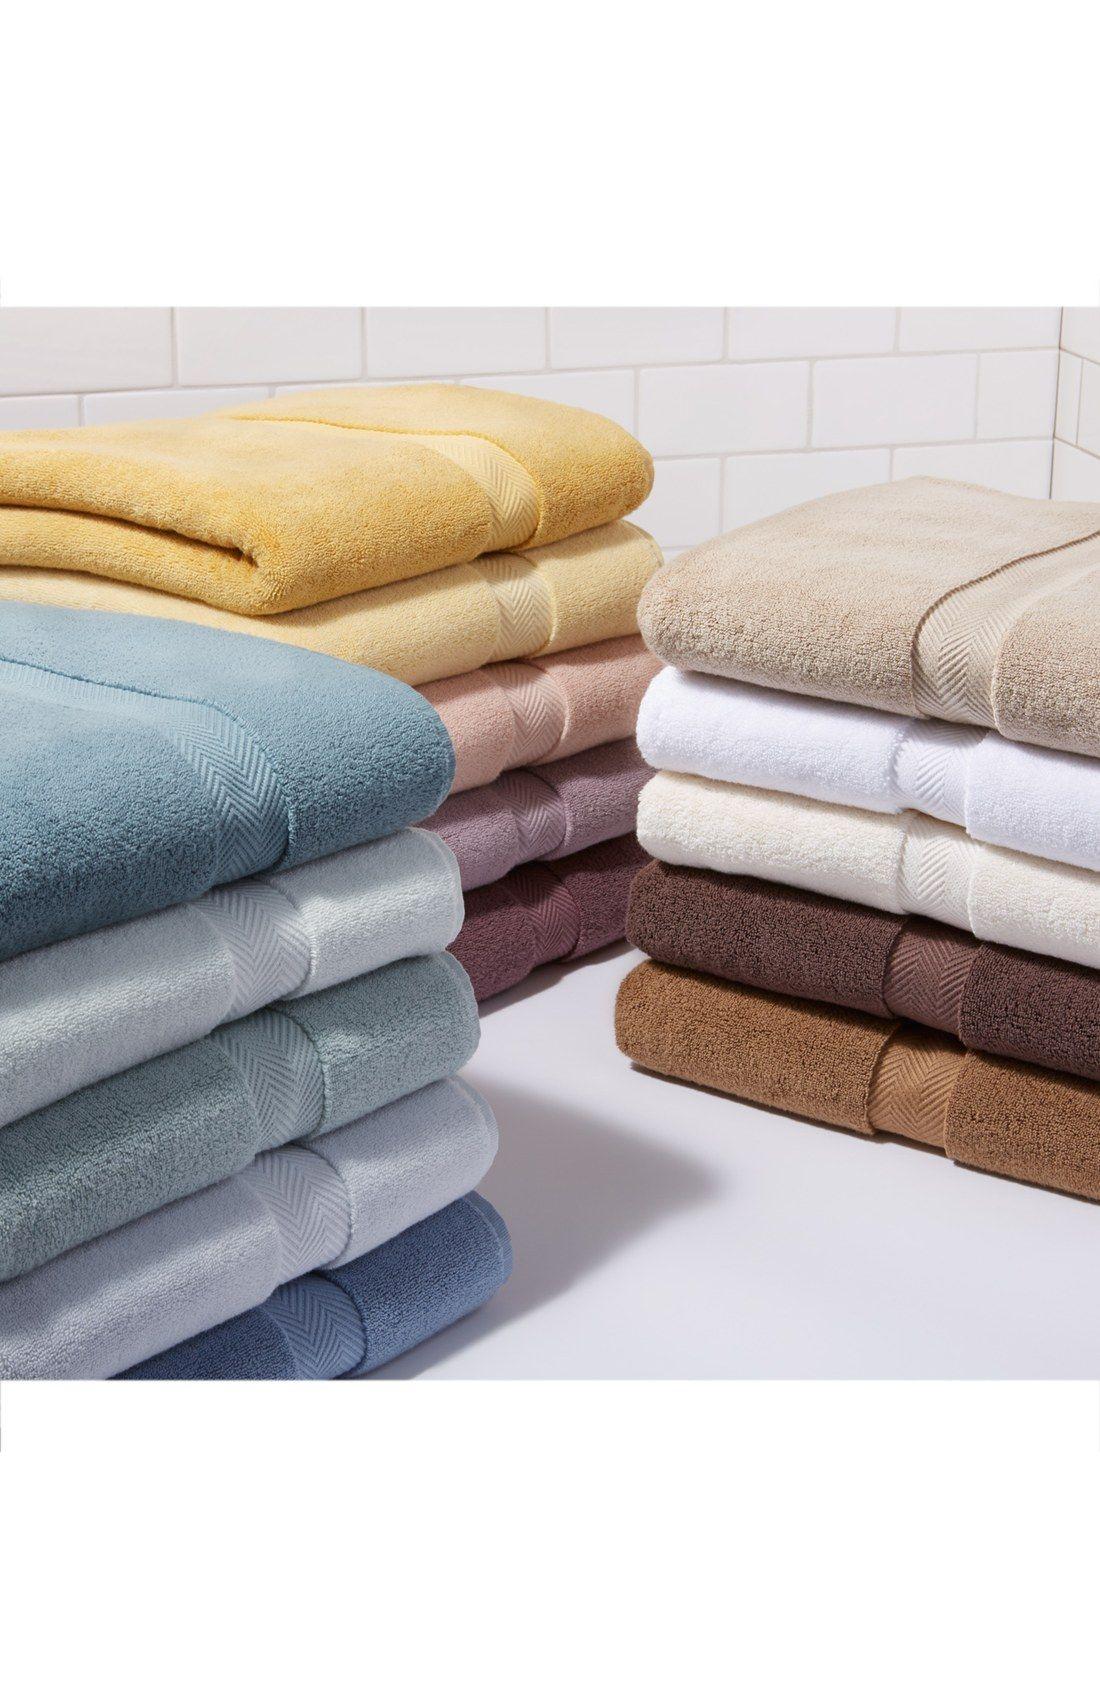 At Home Hydrocotton Bath Towel Towel Bath Towels Washing Clothes